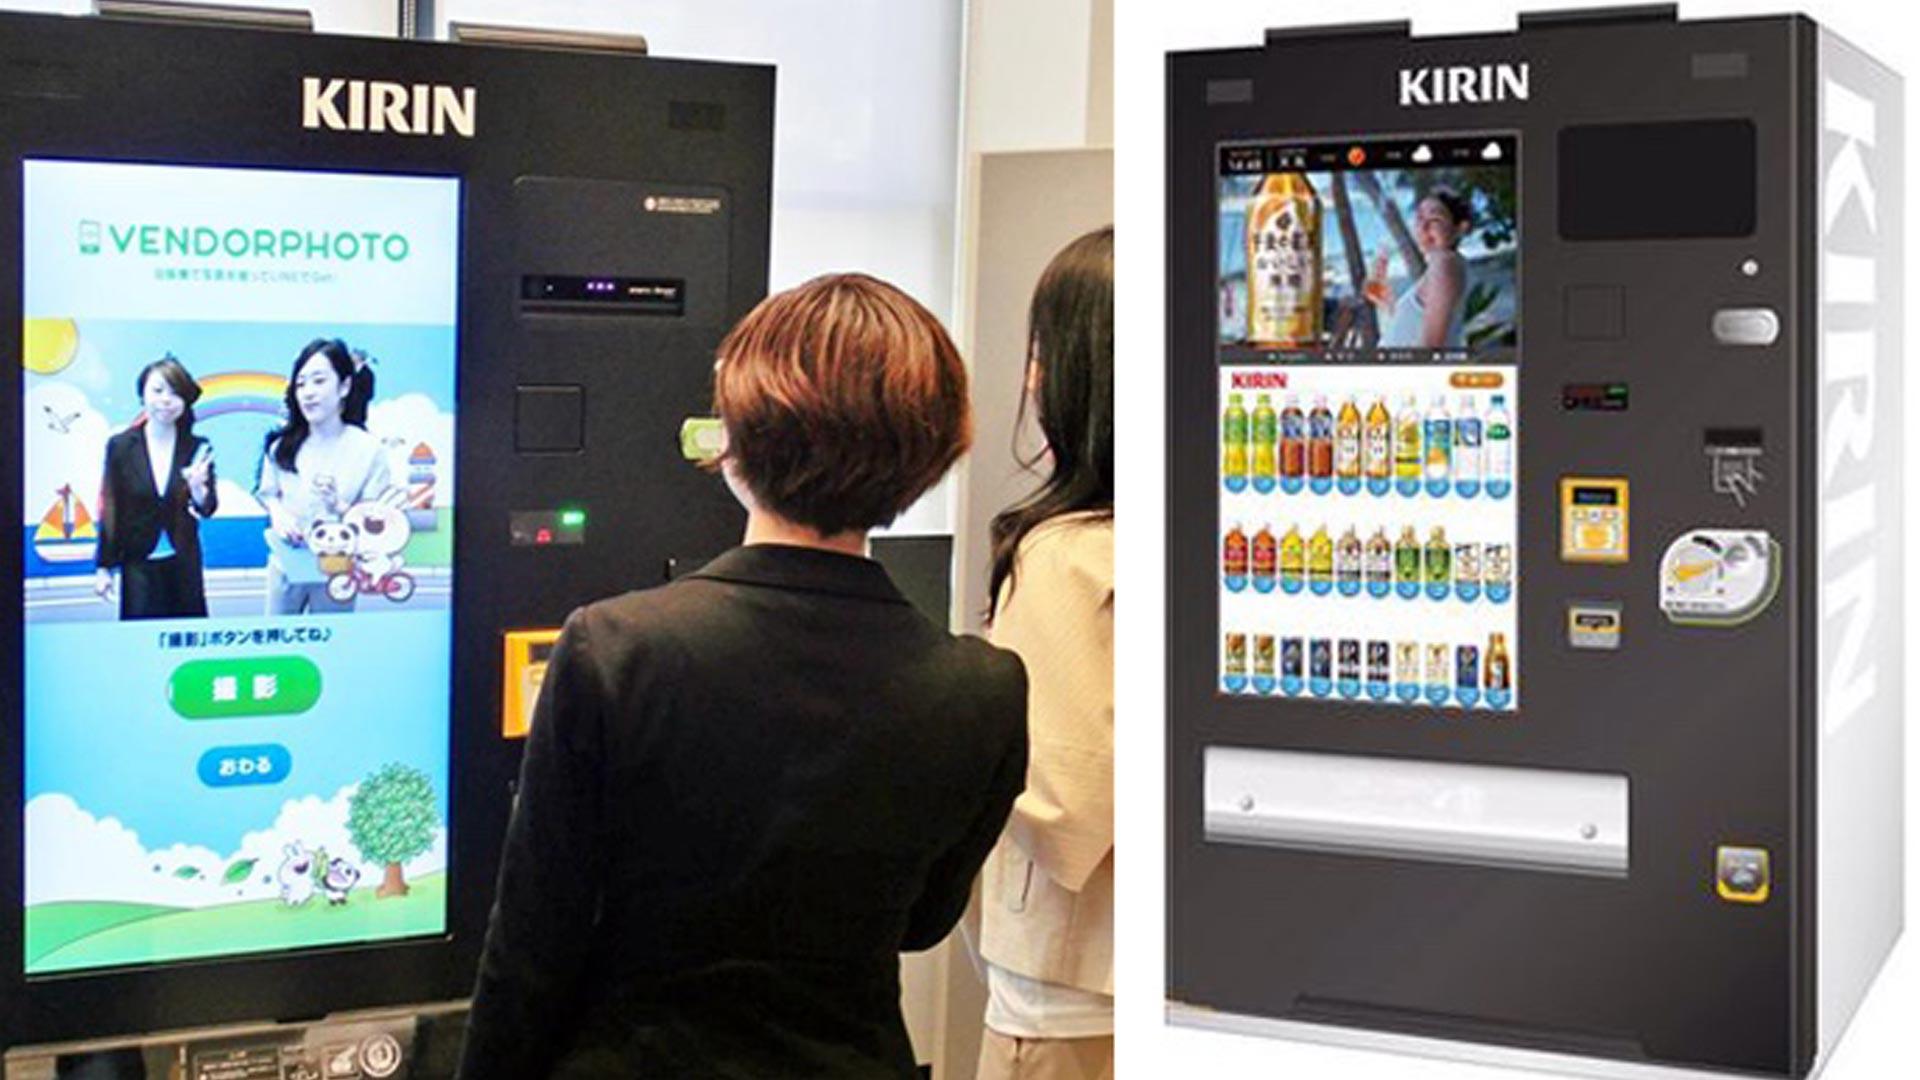 Vending Machine Selfie